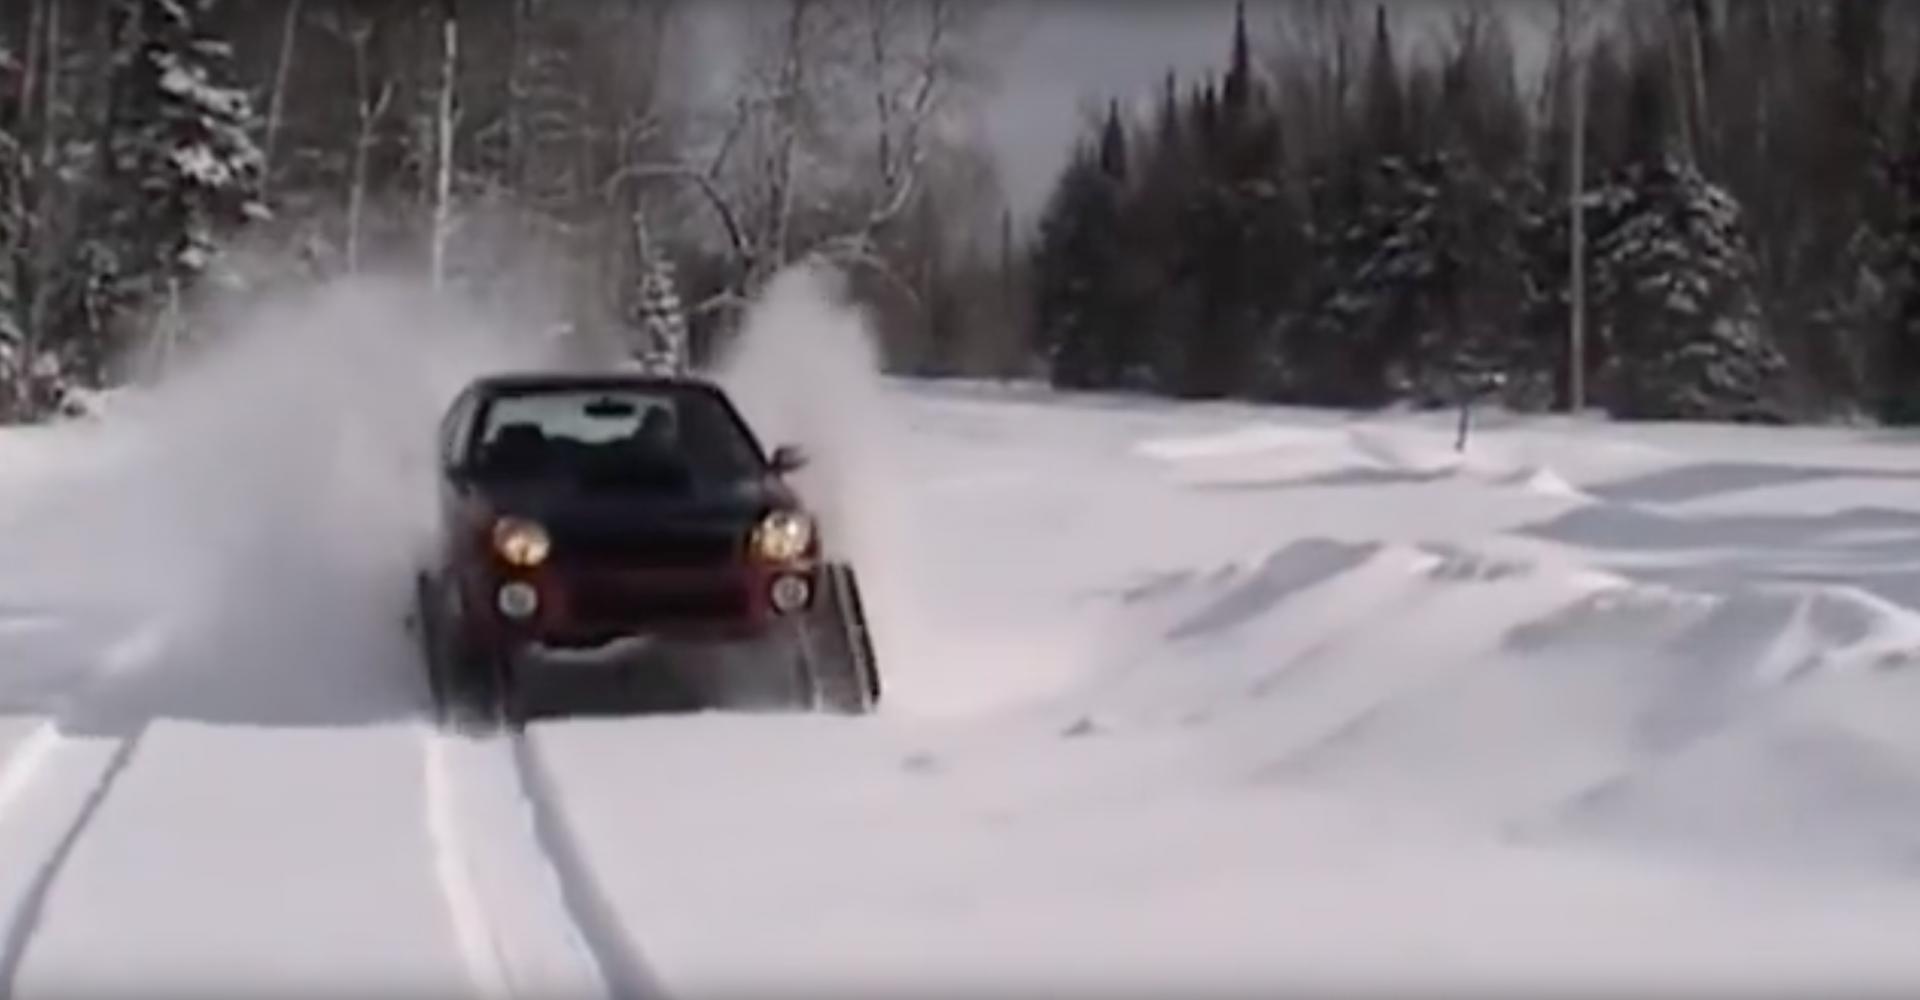 Tracked Subaru Impreza Impresses On Powder